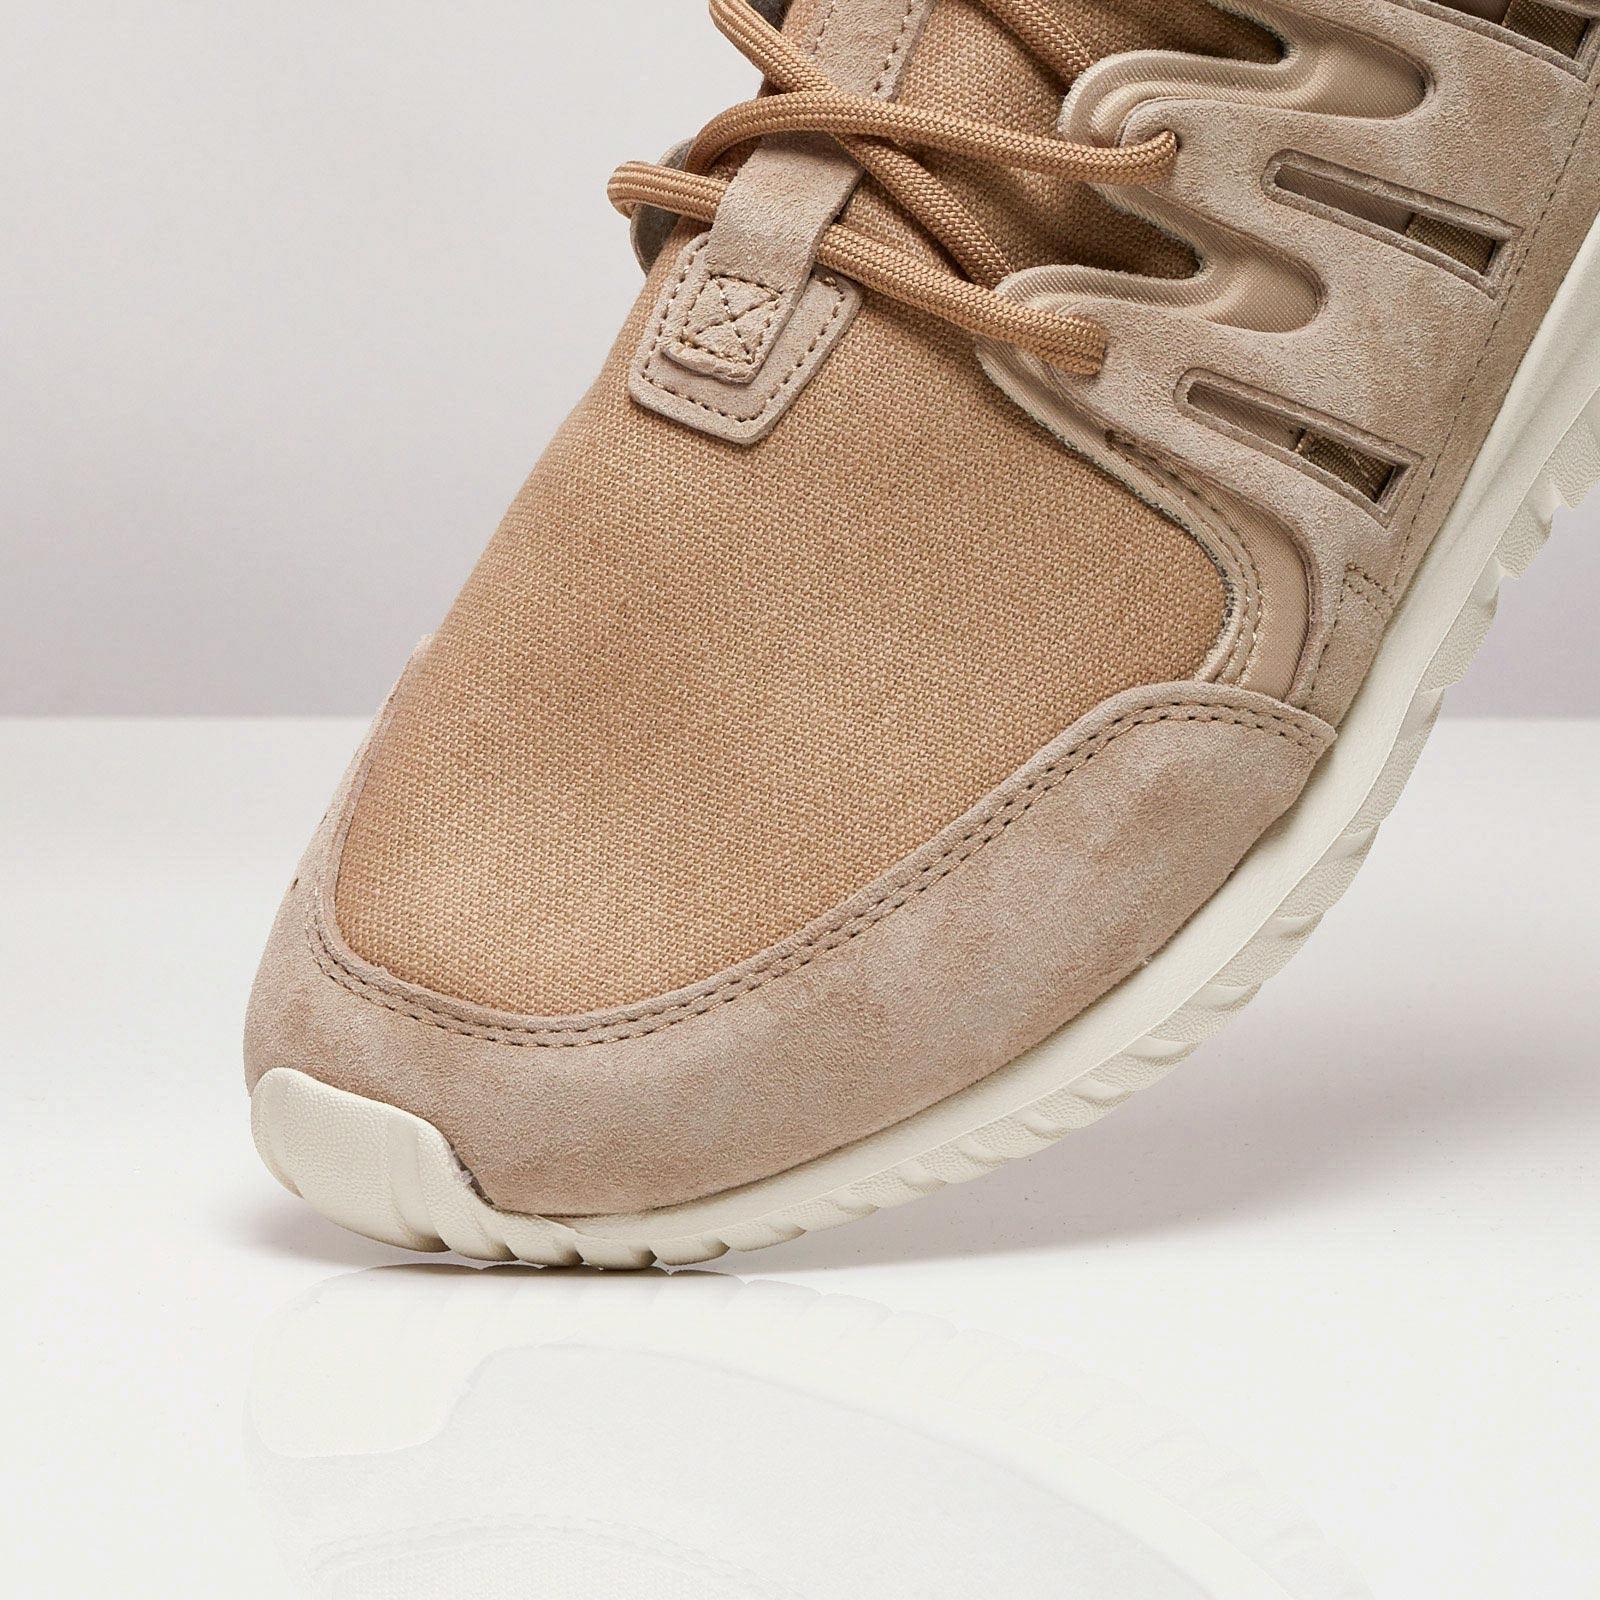 quite nice d3581 88006 adidas Tubular Nova - S74823 - Sneakersnstuff | sneakers ...